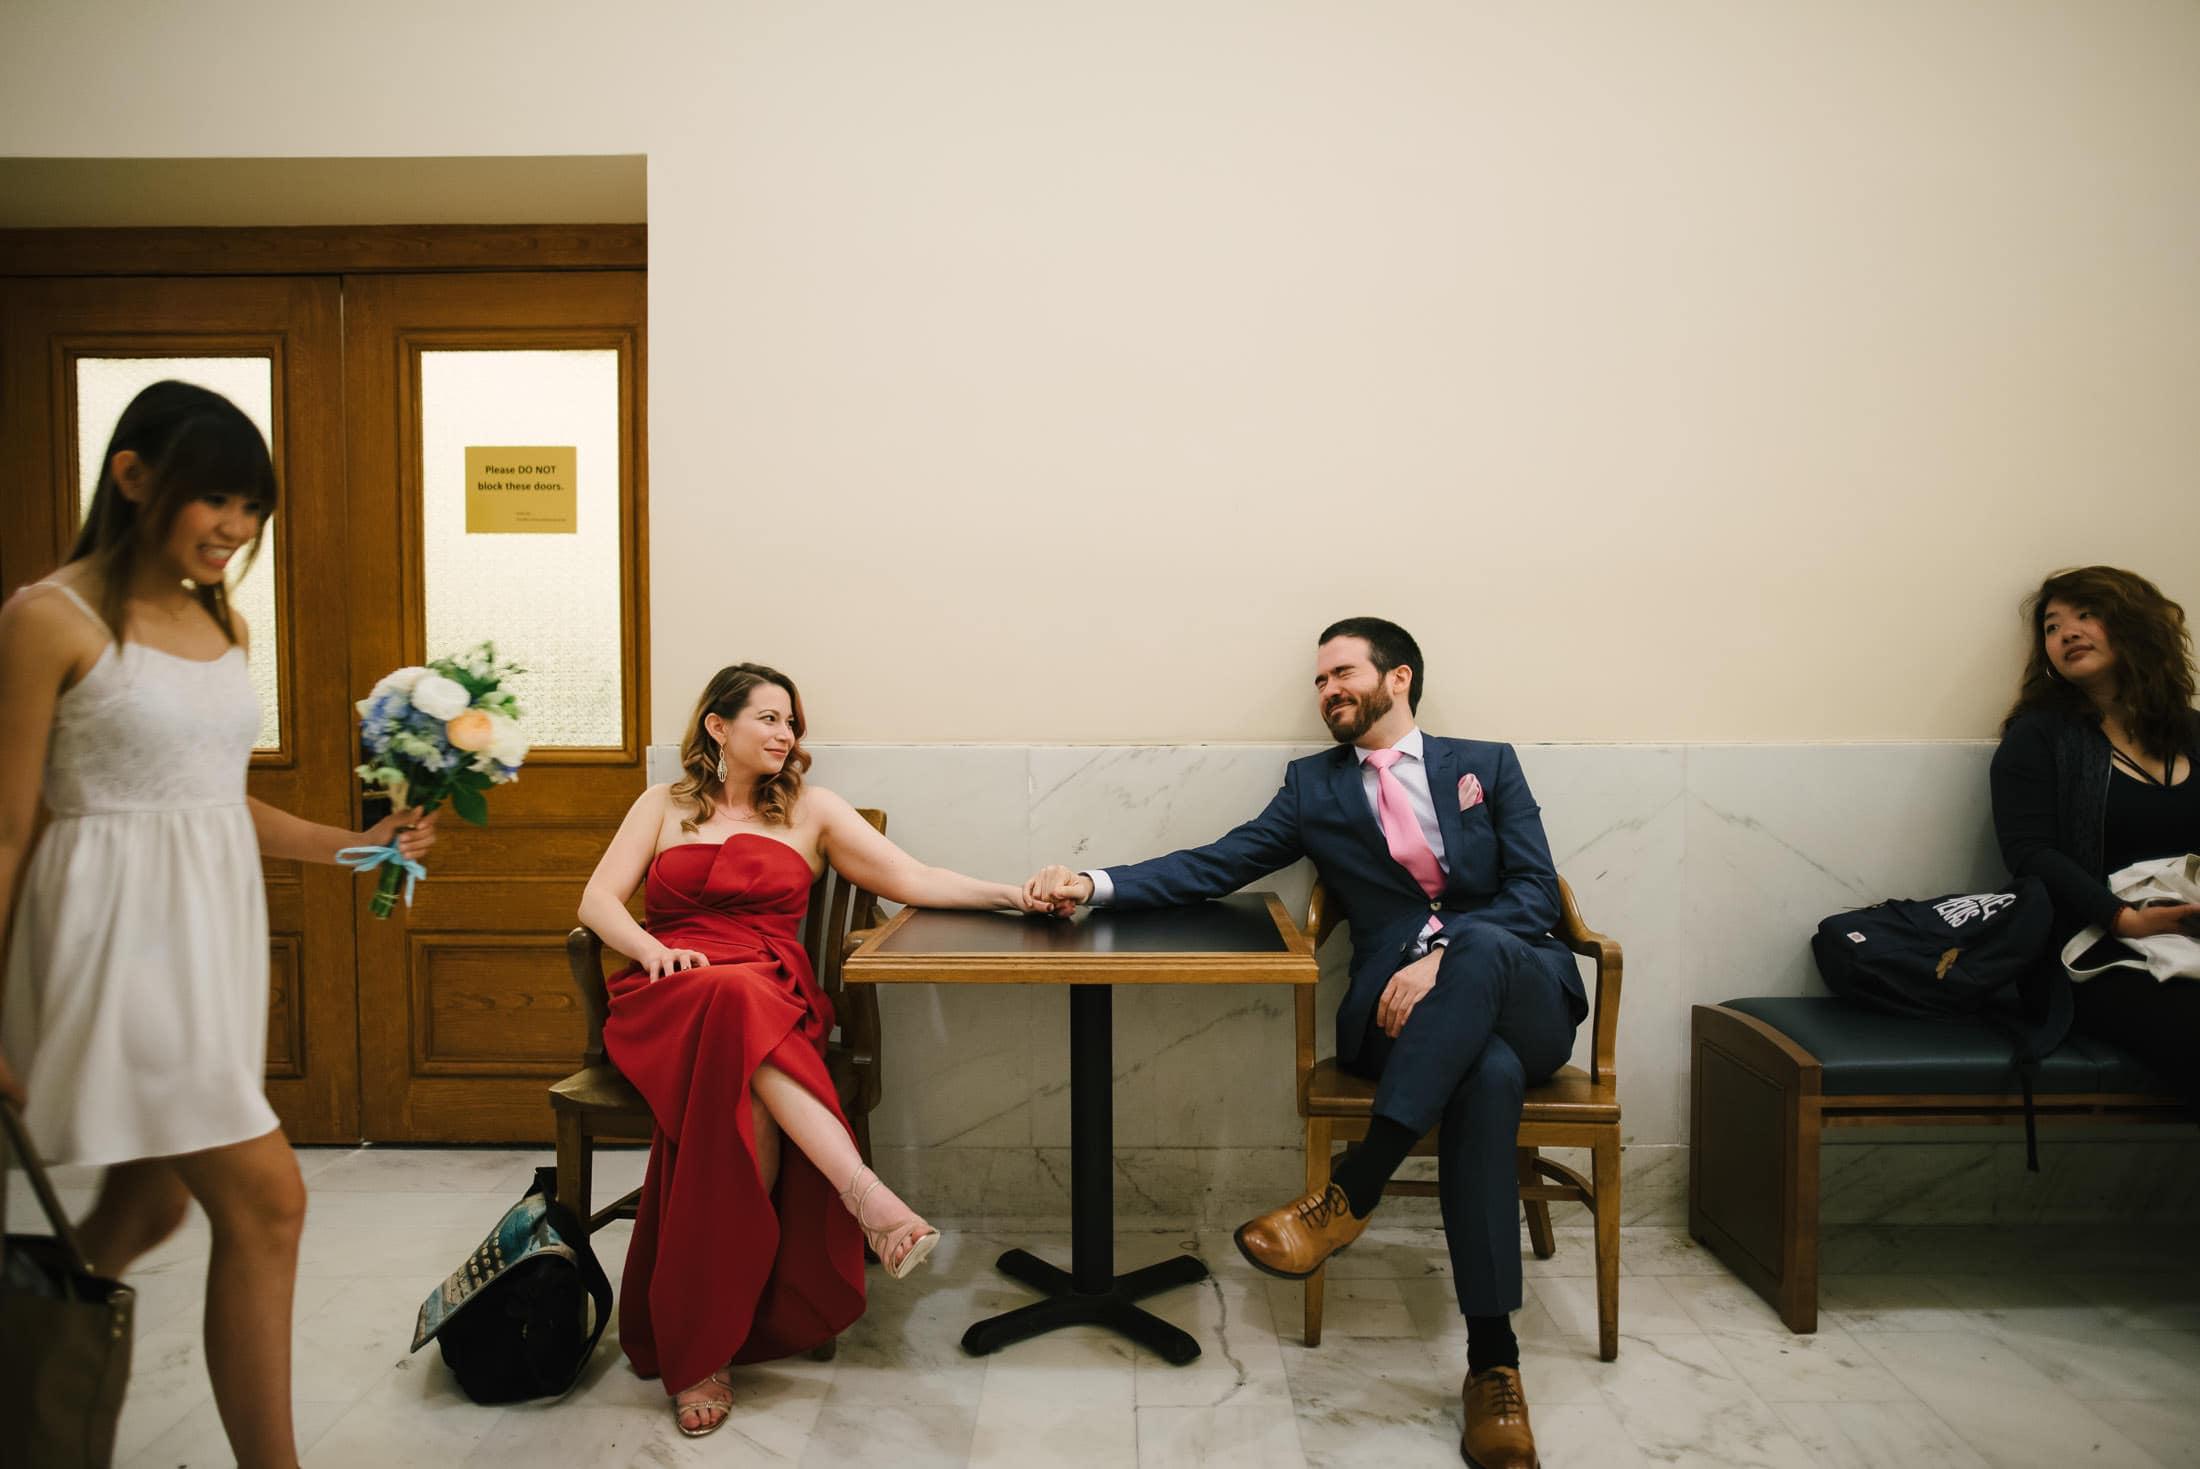 San Francisco City Hall Wedding waiting area